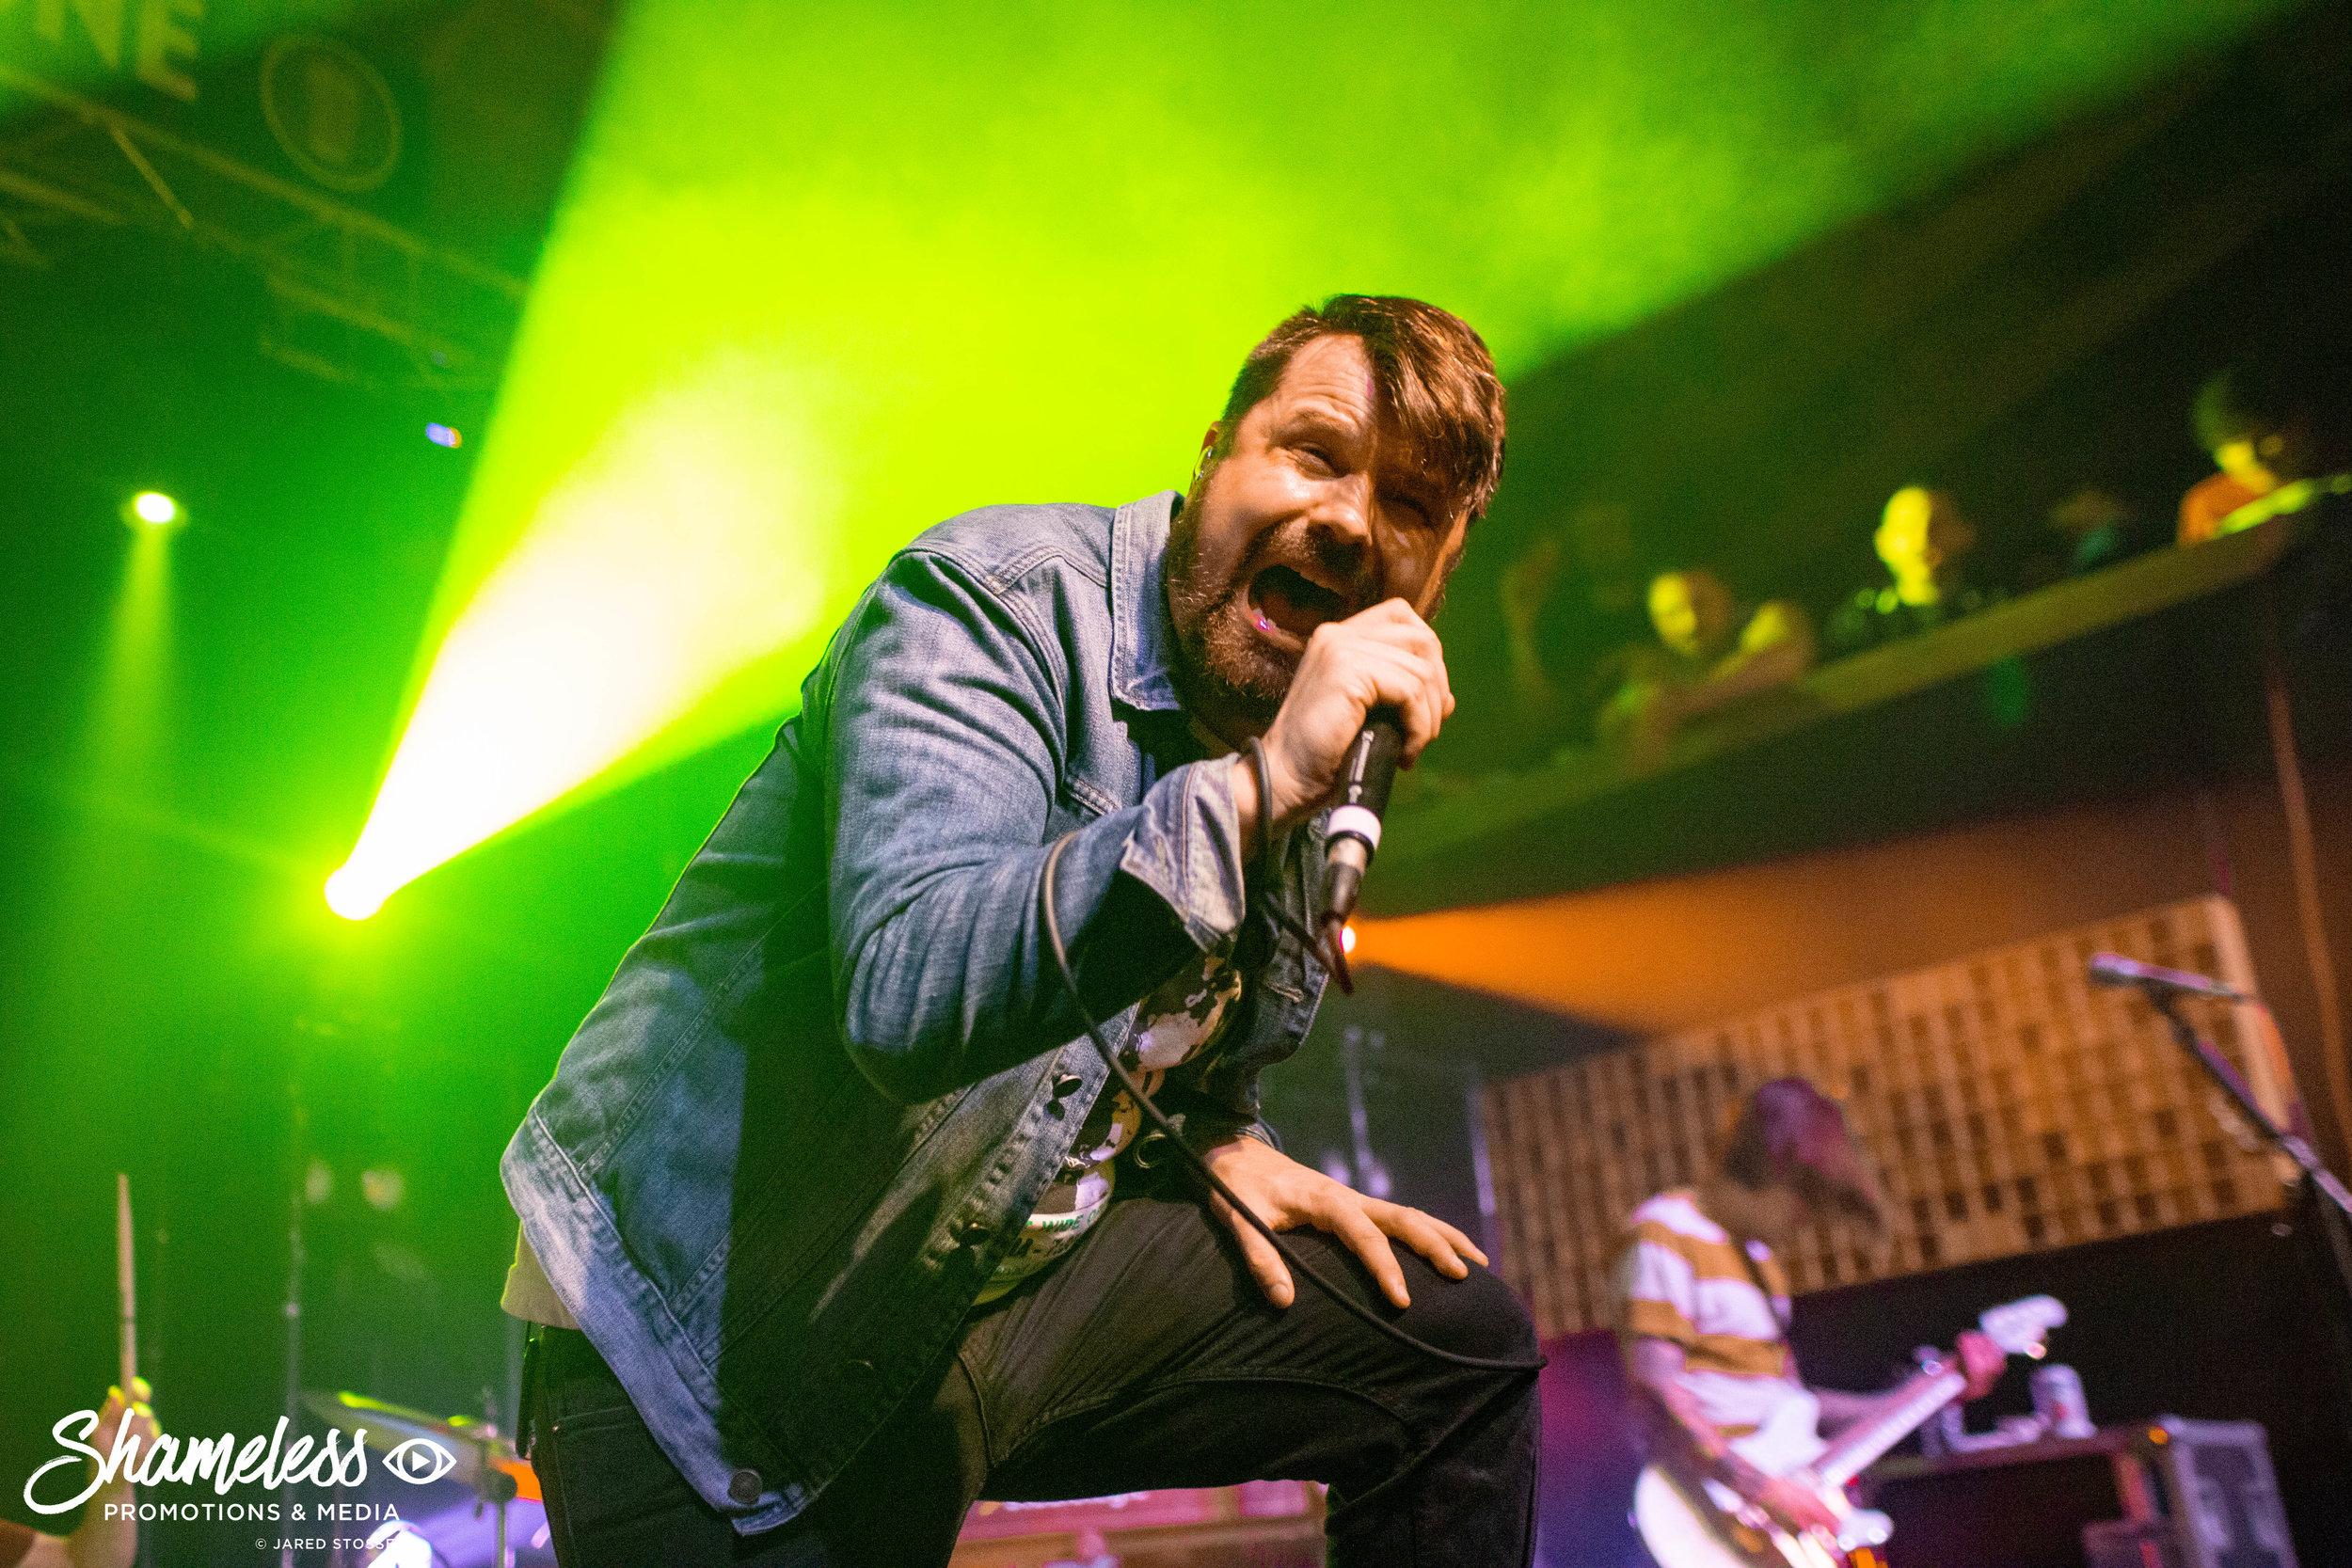 Silverstein 'When Broken Is Easily Fixed' 15-Year Anniversary Tour @ Cornerstone: January 2019